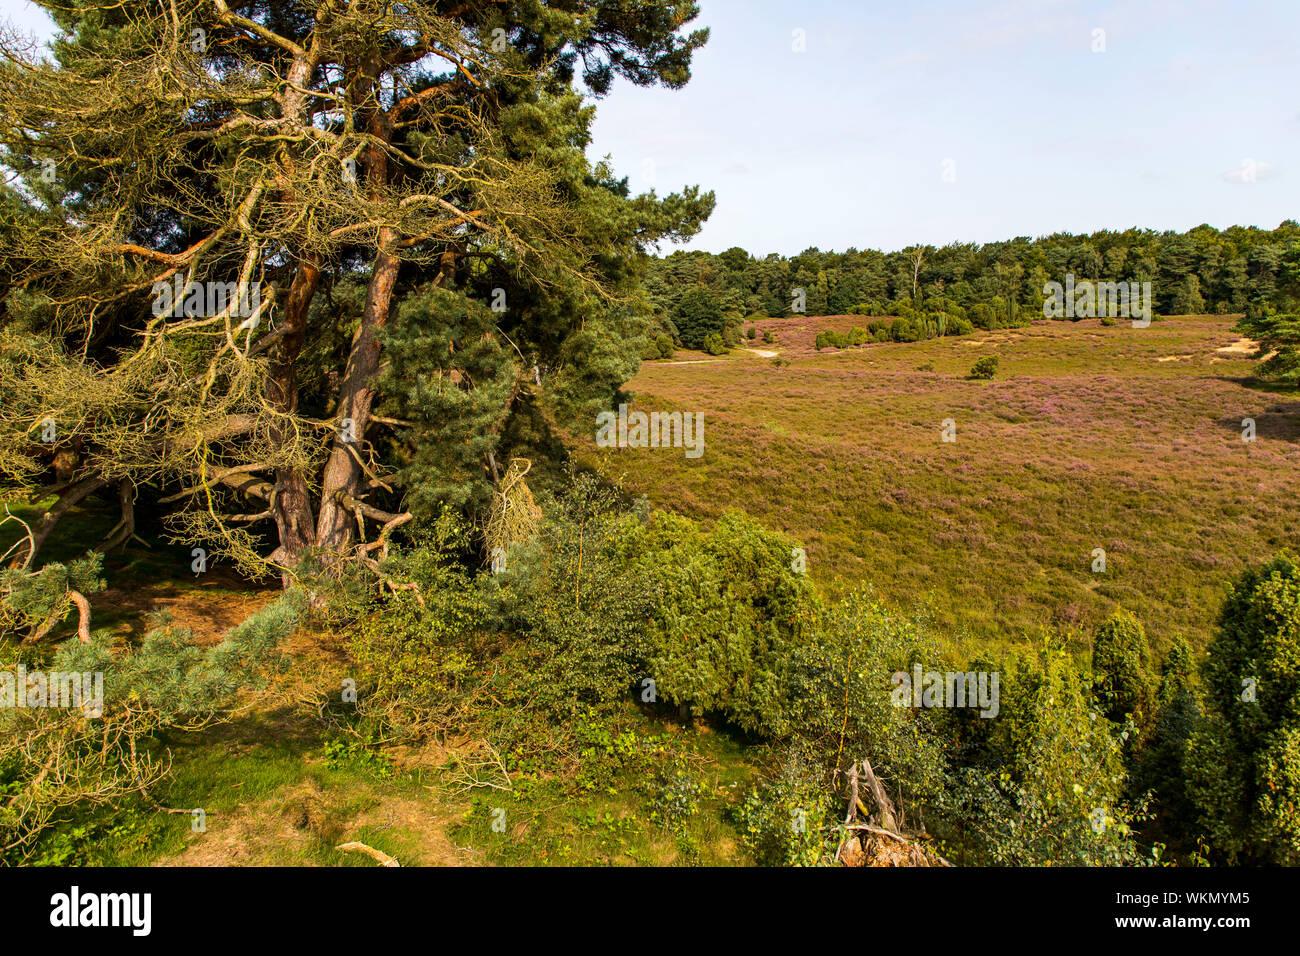 The Westruper Heide, in the nature park Hohe Mark Westmünsterland, near Haltern, Heather blossom,   Germany Stock Photo